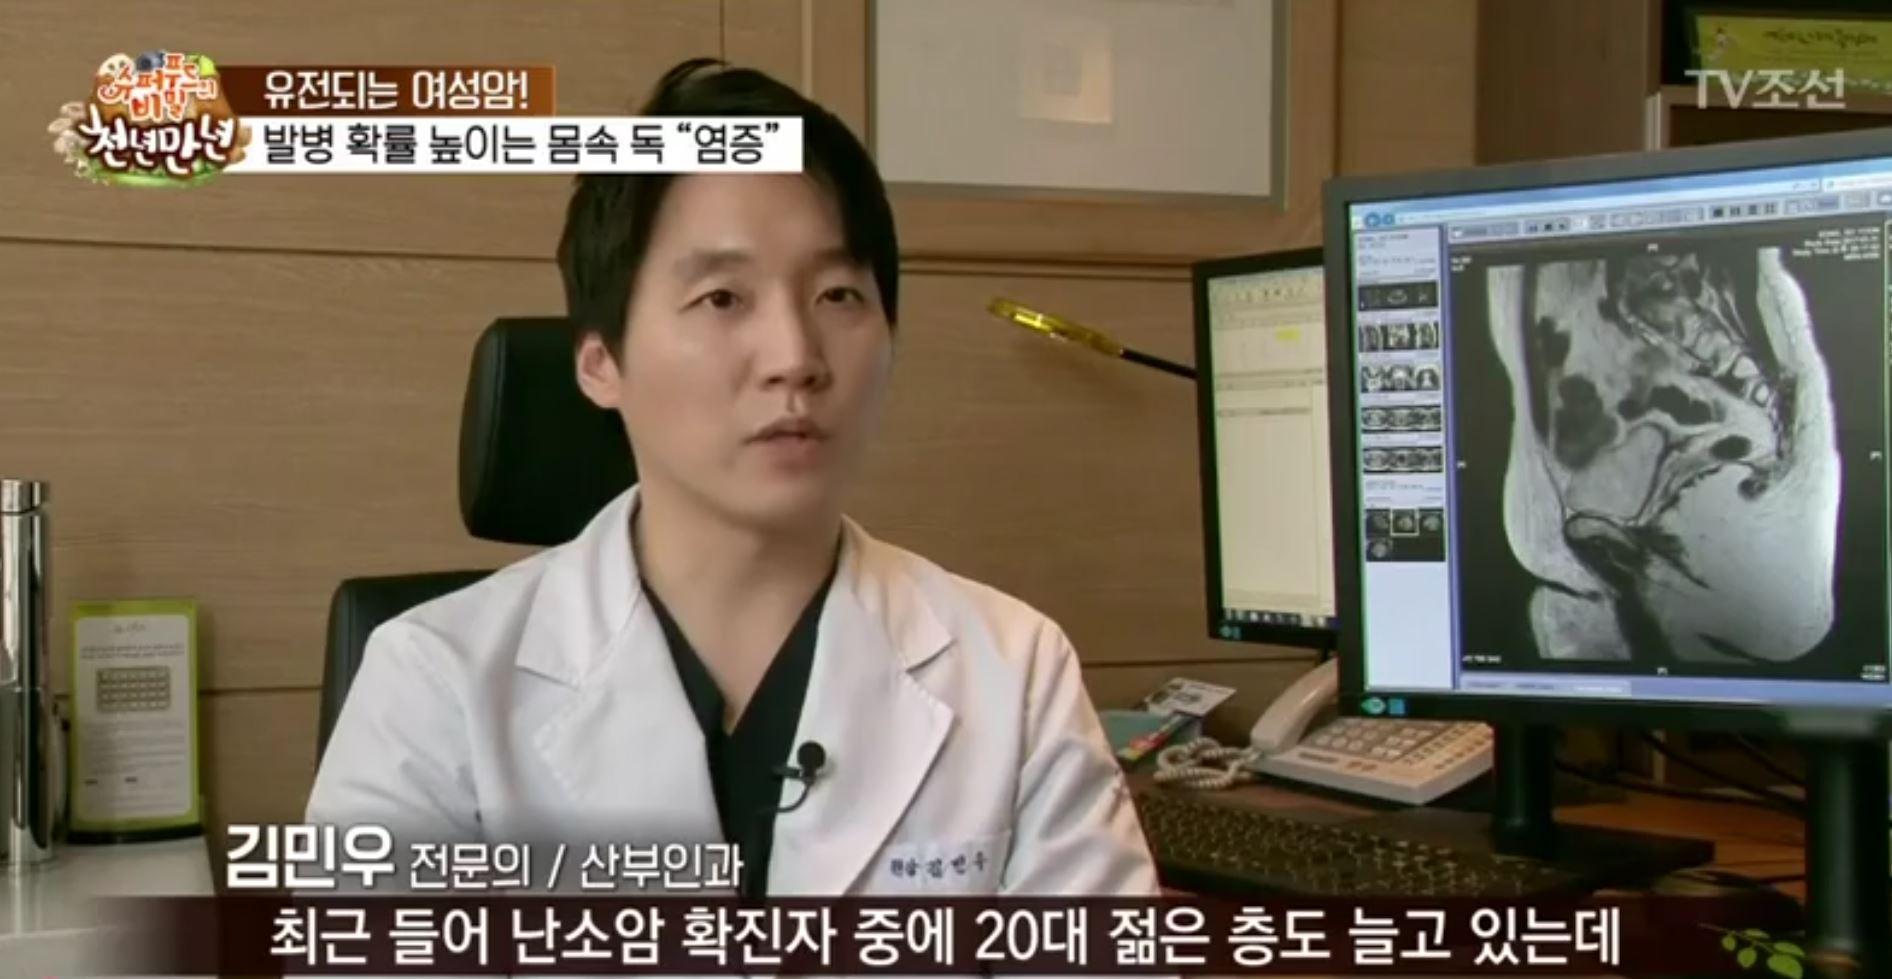 [TV조선] 난소암 인터뷰